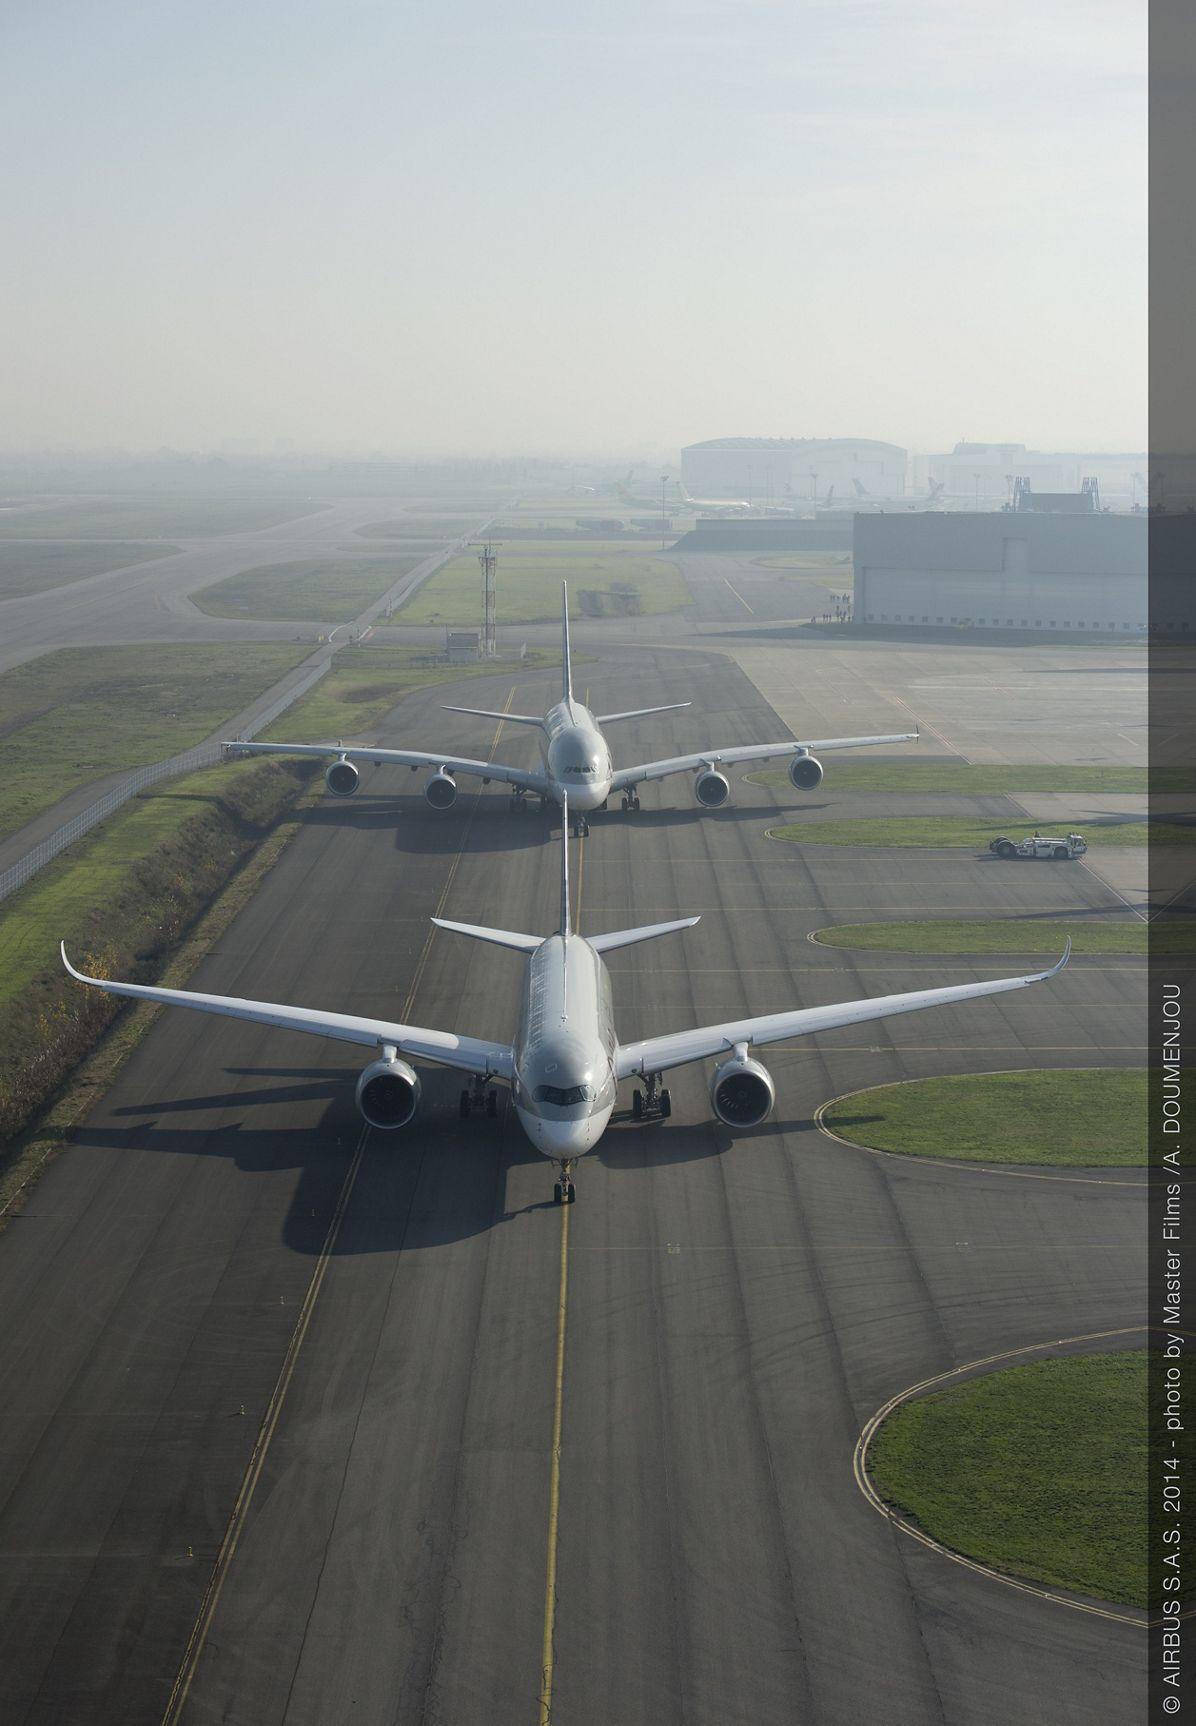 Qatar Airways A350 XWB and A380 taxiing_3